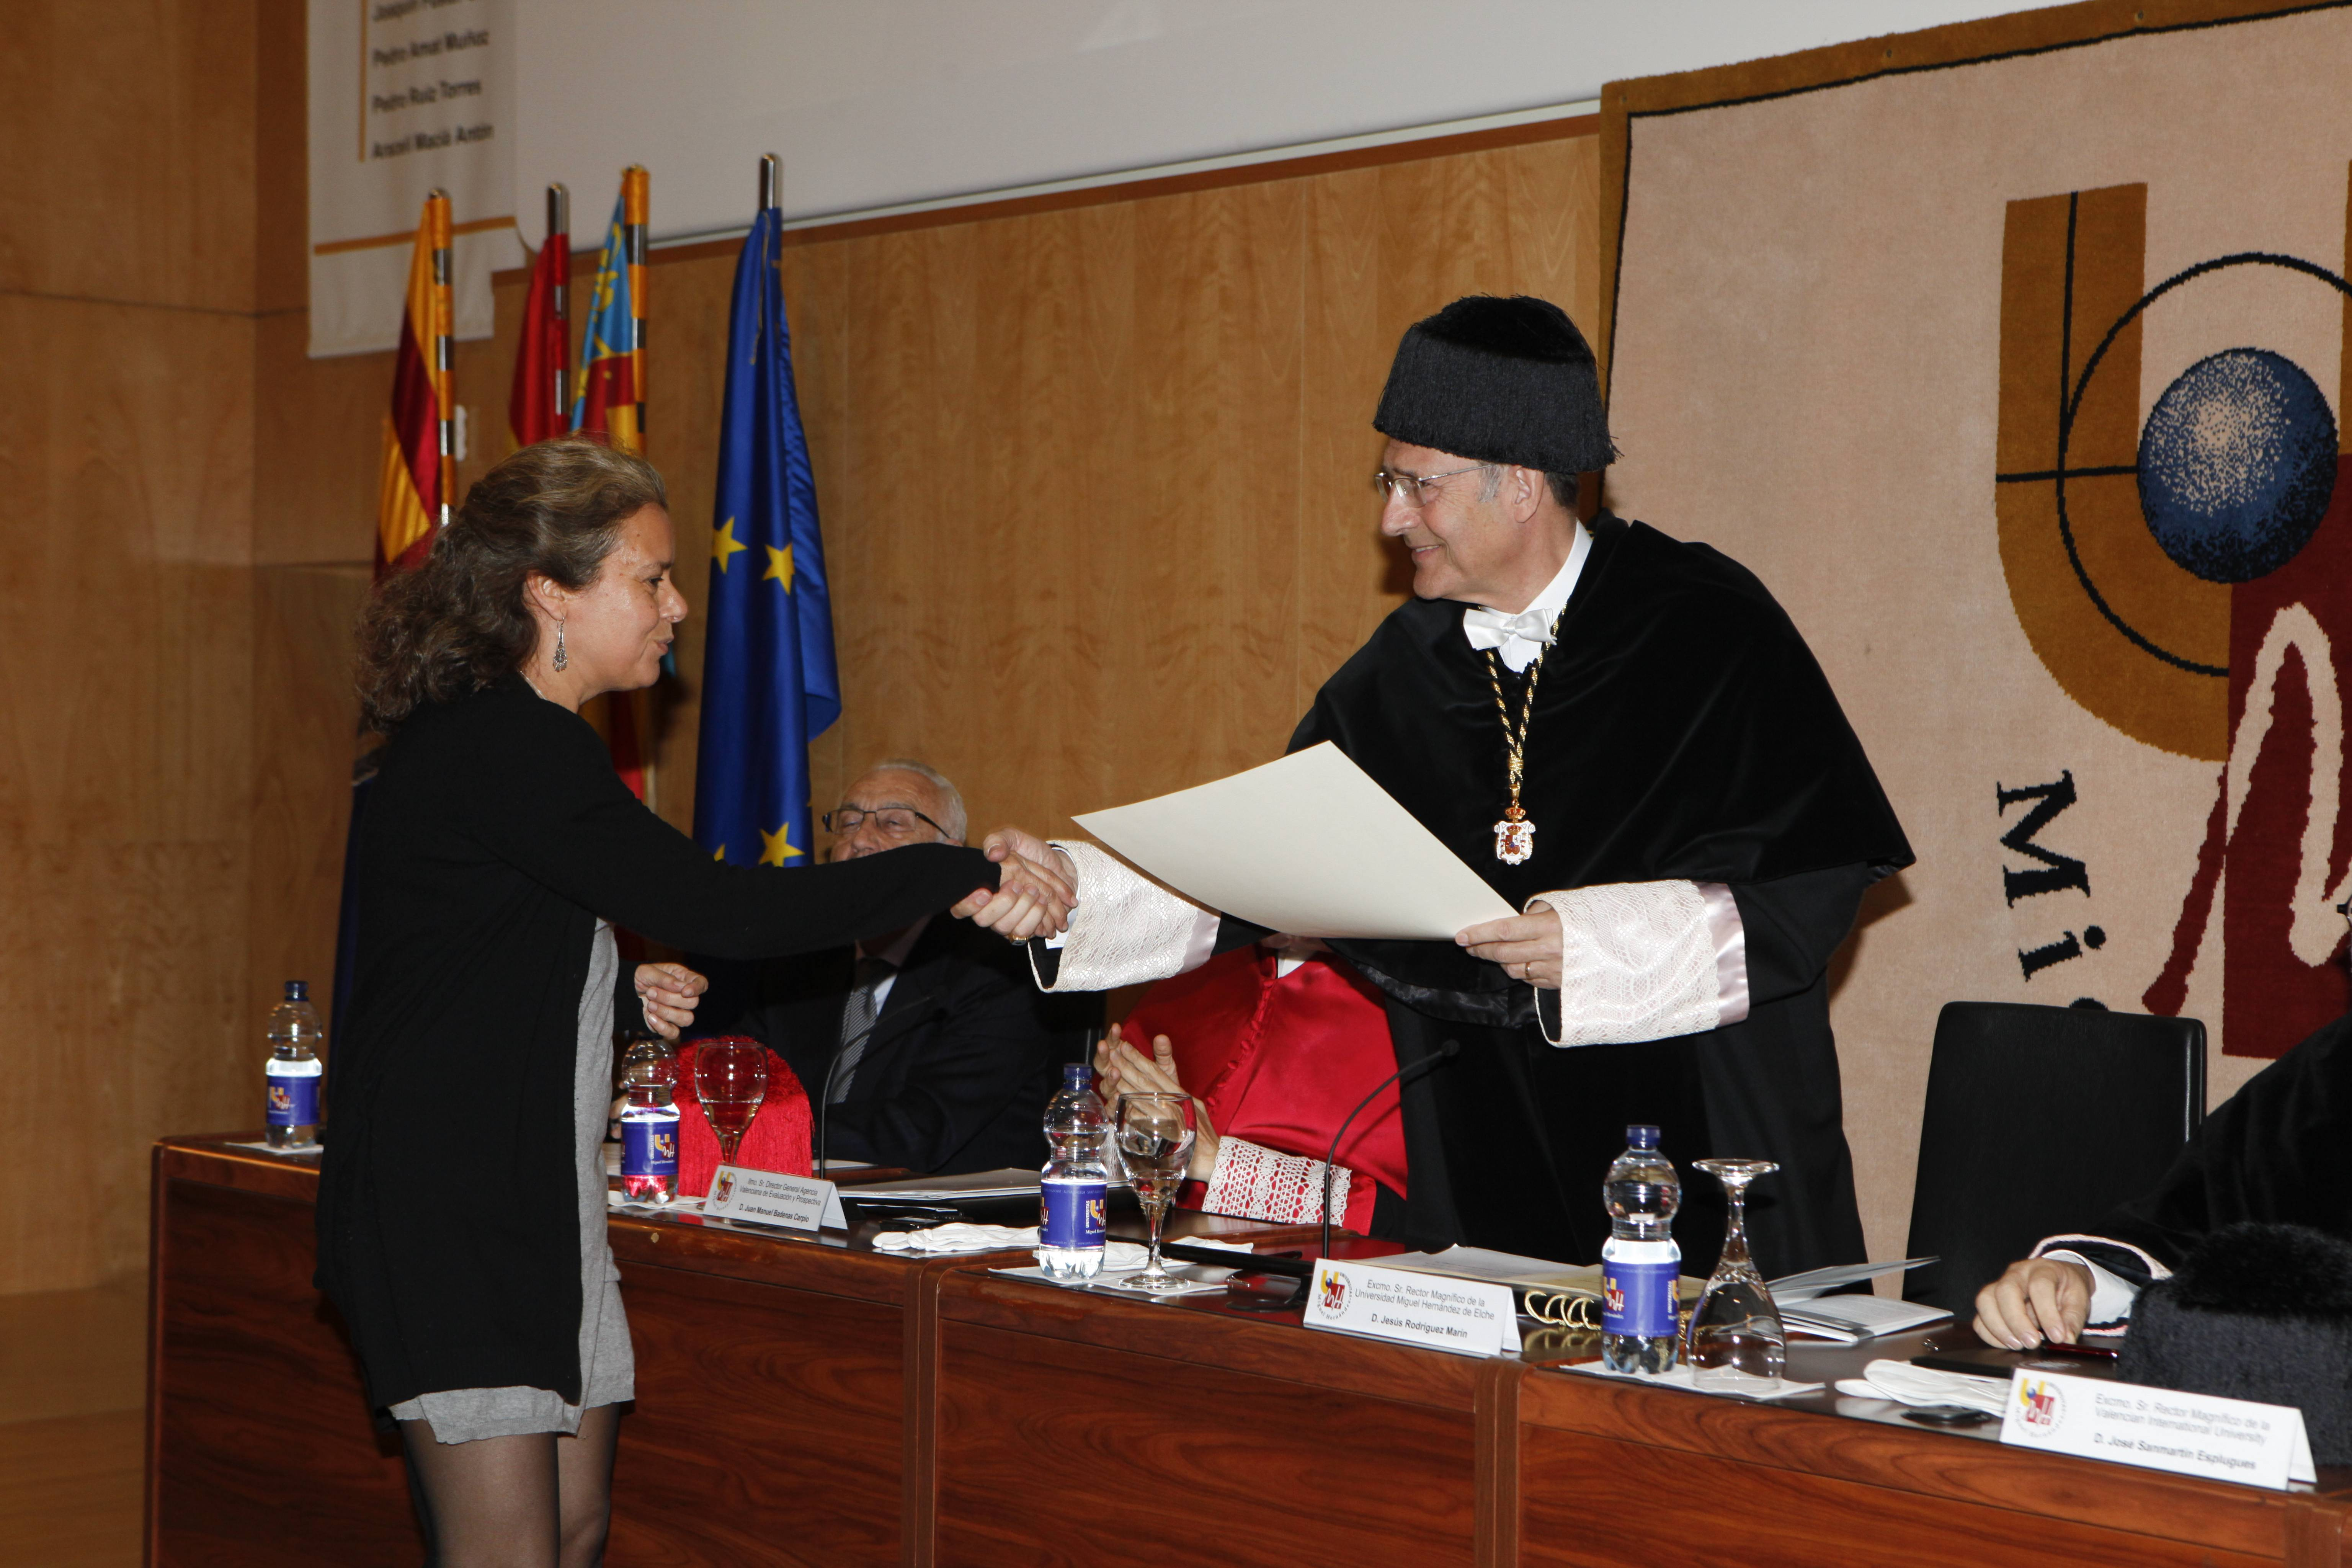 doctor-honoris-causa-luis-gamir_mg_1053.jpg